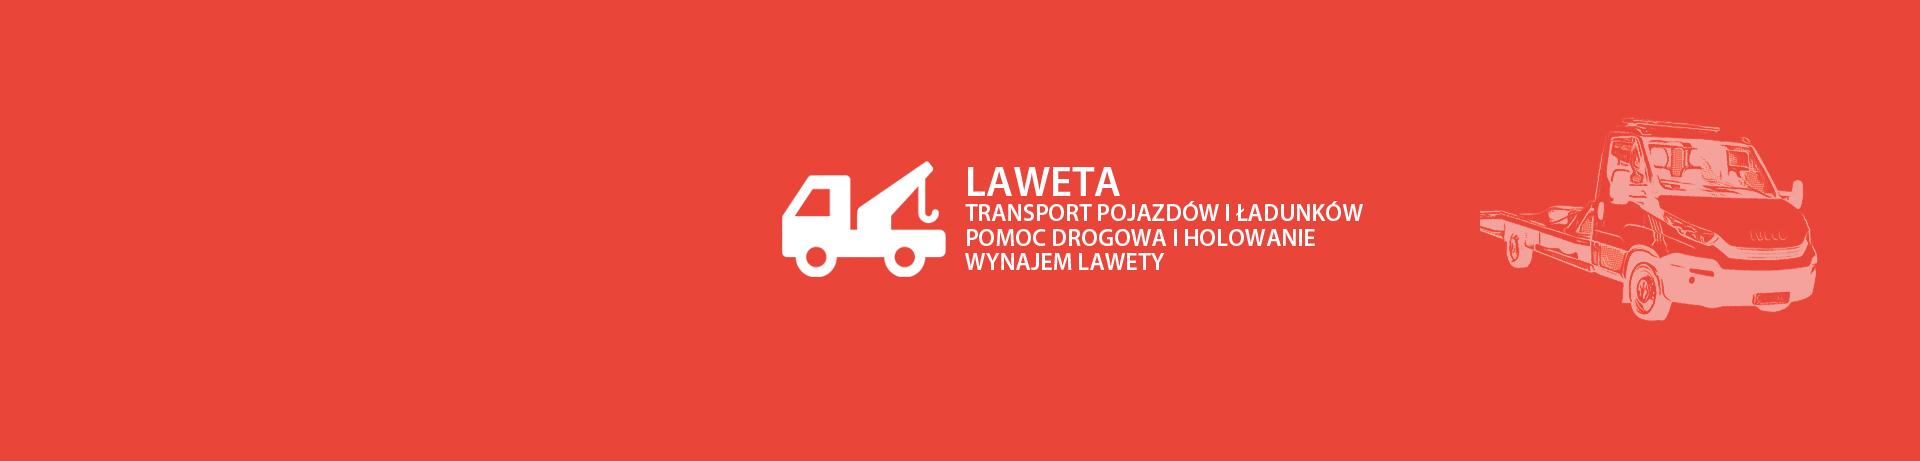 Laweta - banner